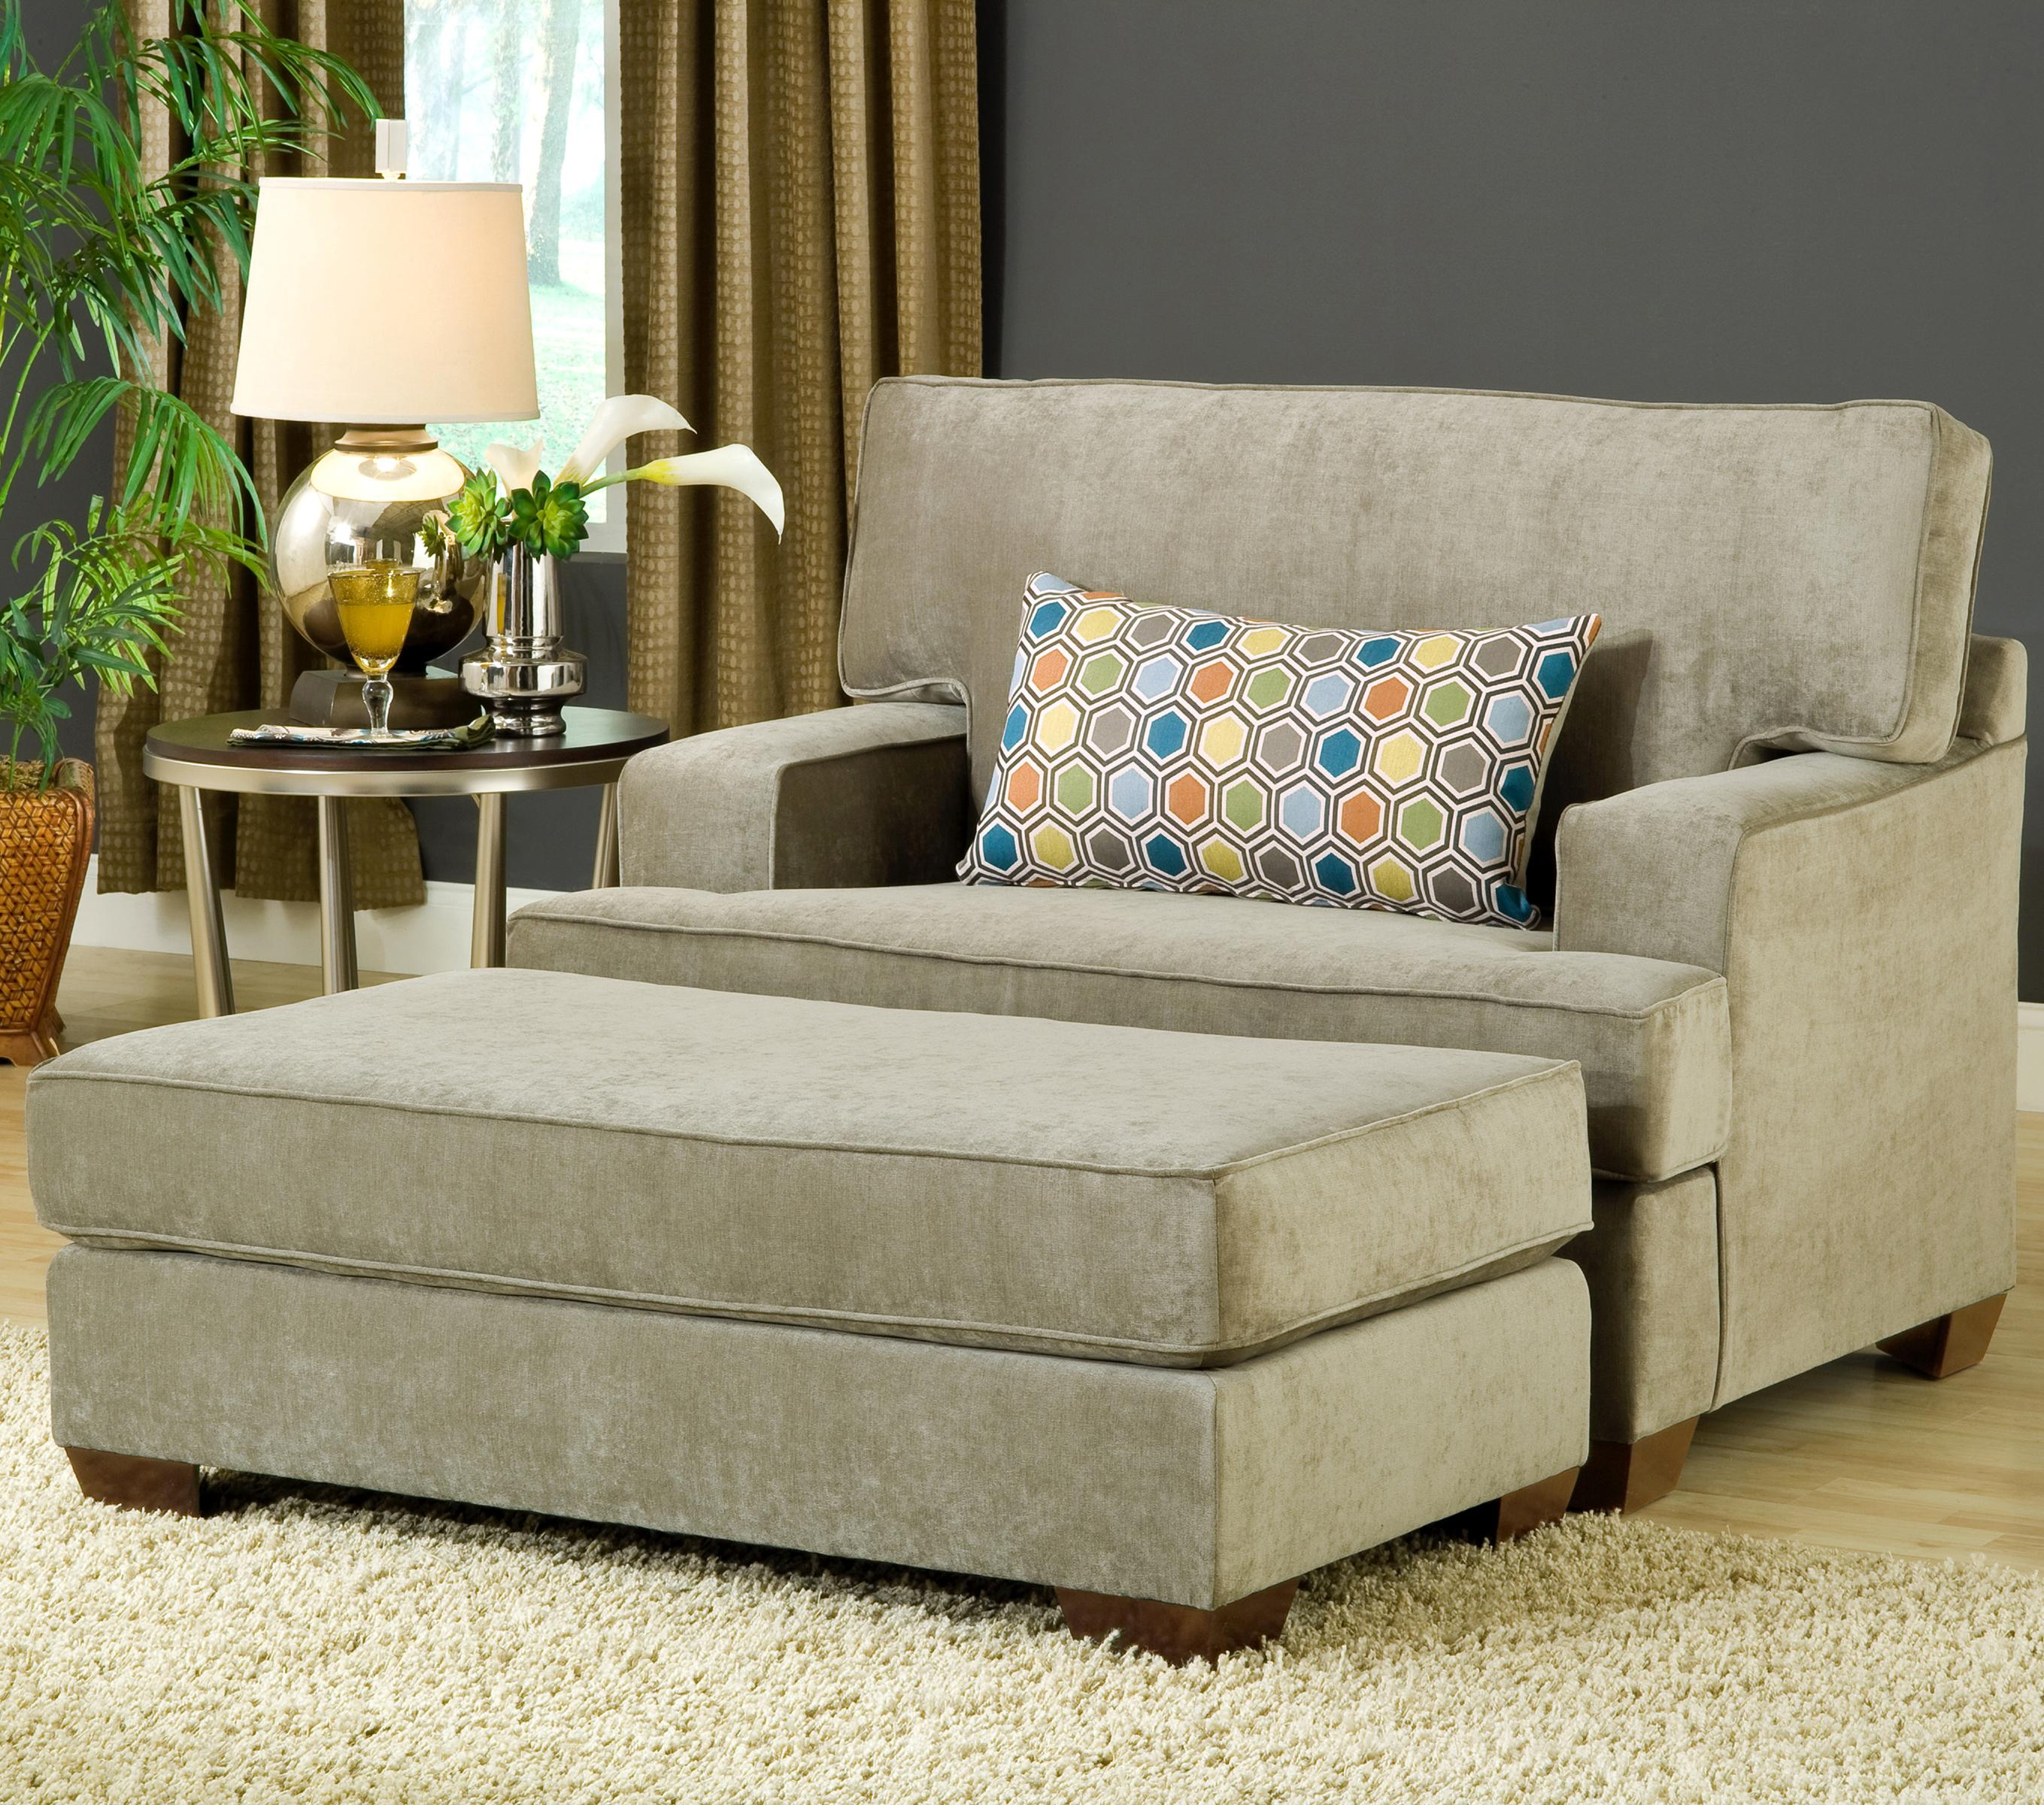 Daniel Chair and Ottoman by VFM Essentials at Virginia Furniture Market